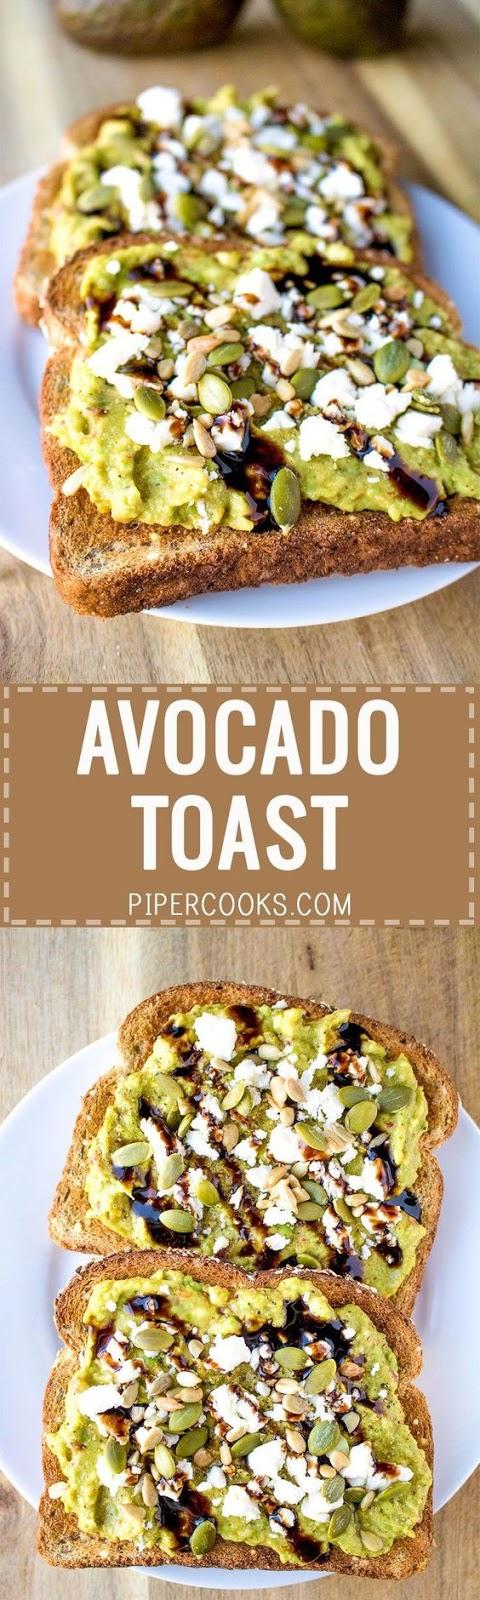 Avocado Toast with Feta Cheese and Balsamic Glaze